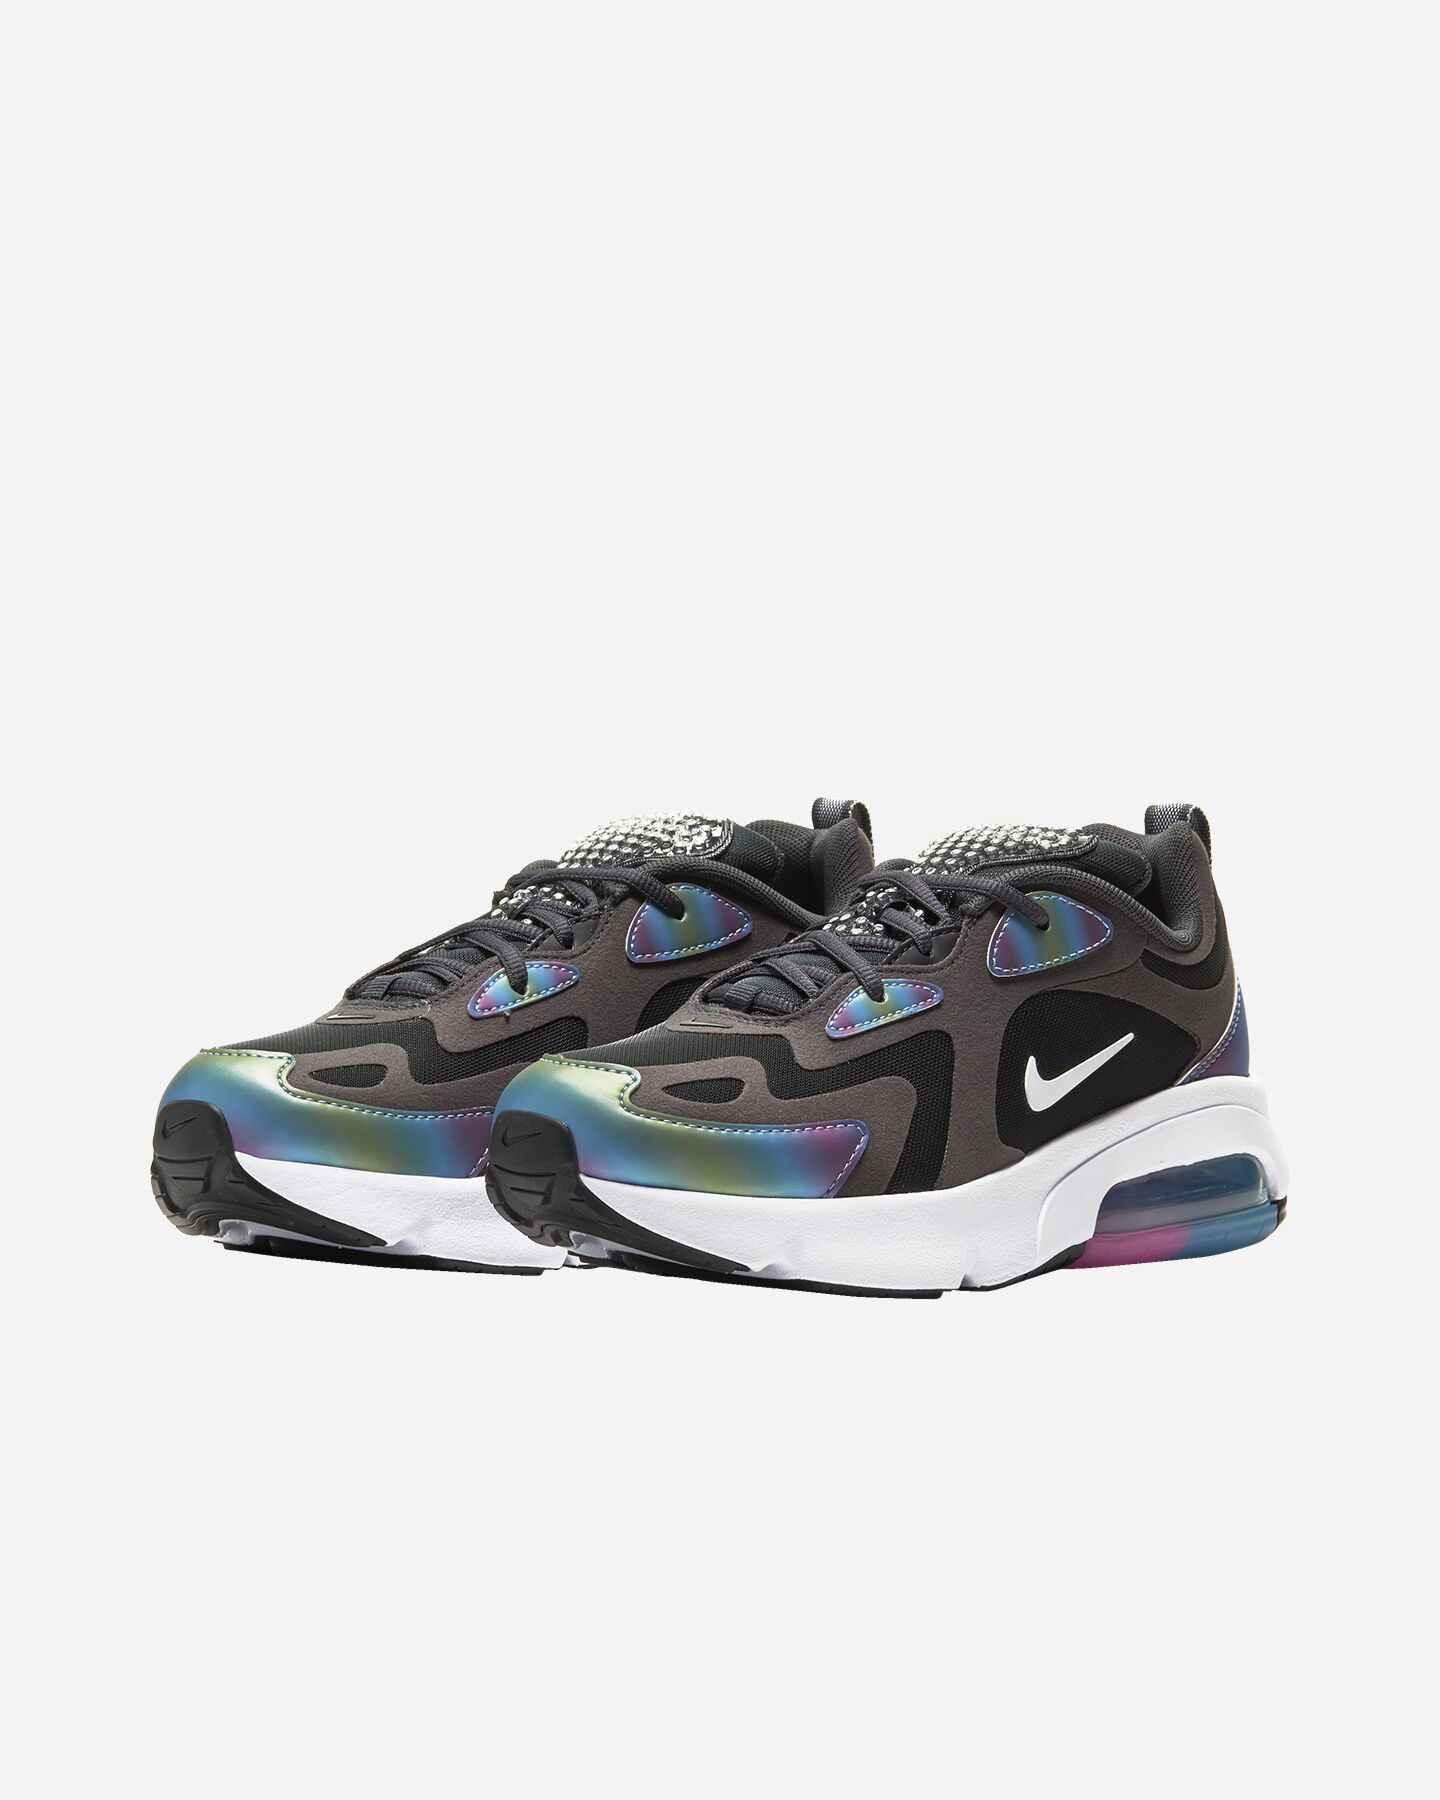 Scarpe sneakers NIKE AIR MAX 200 20 JR GS S5162406 scatto 1